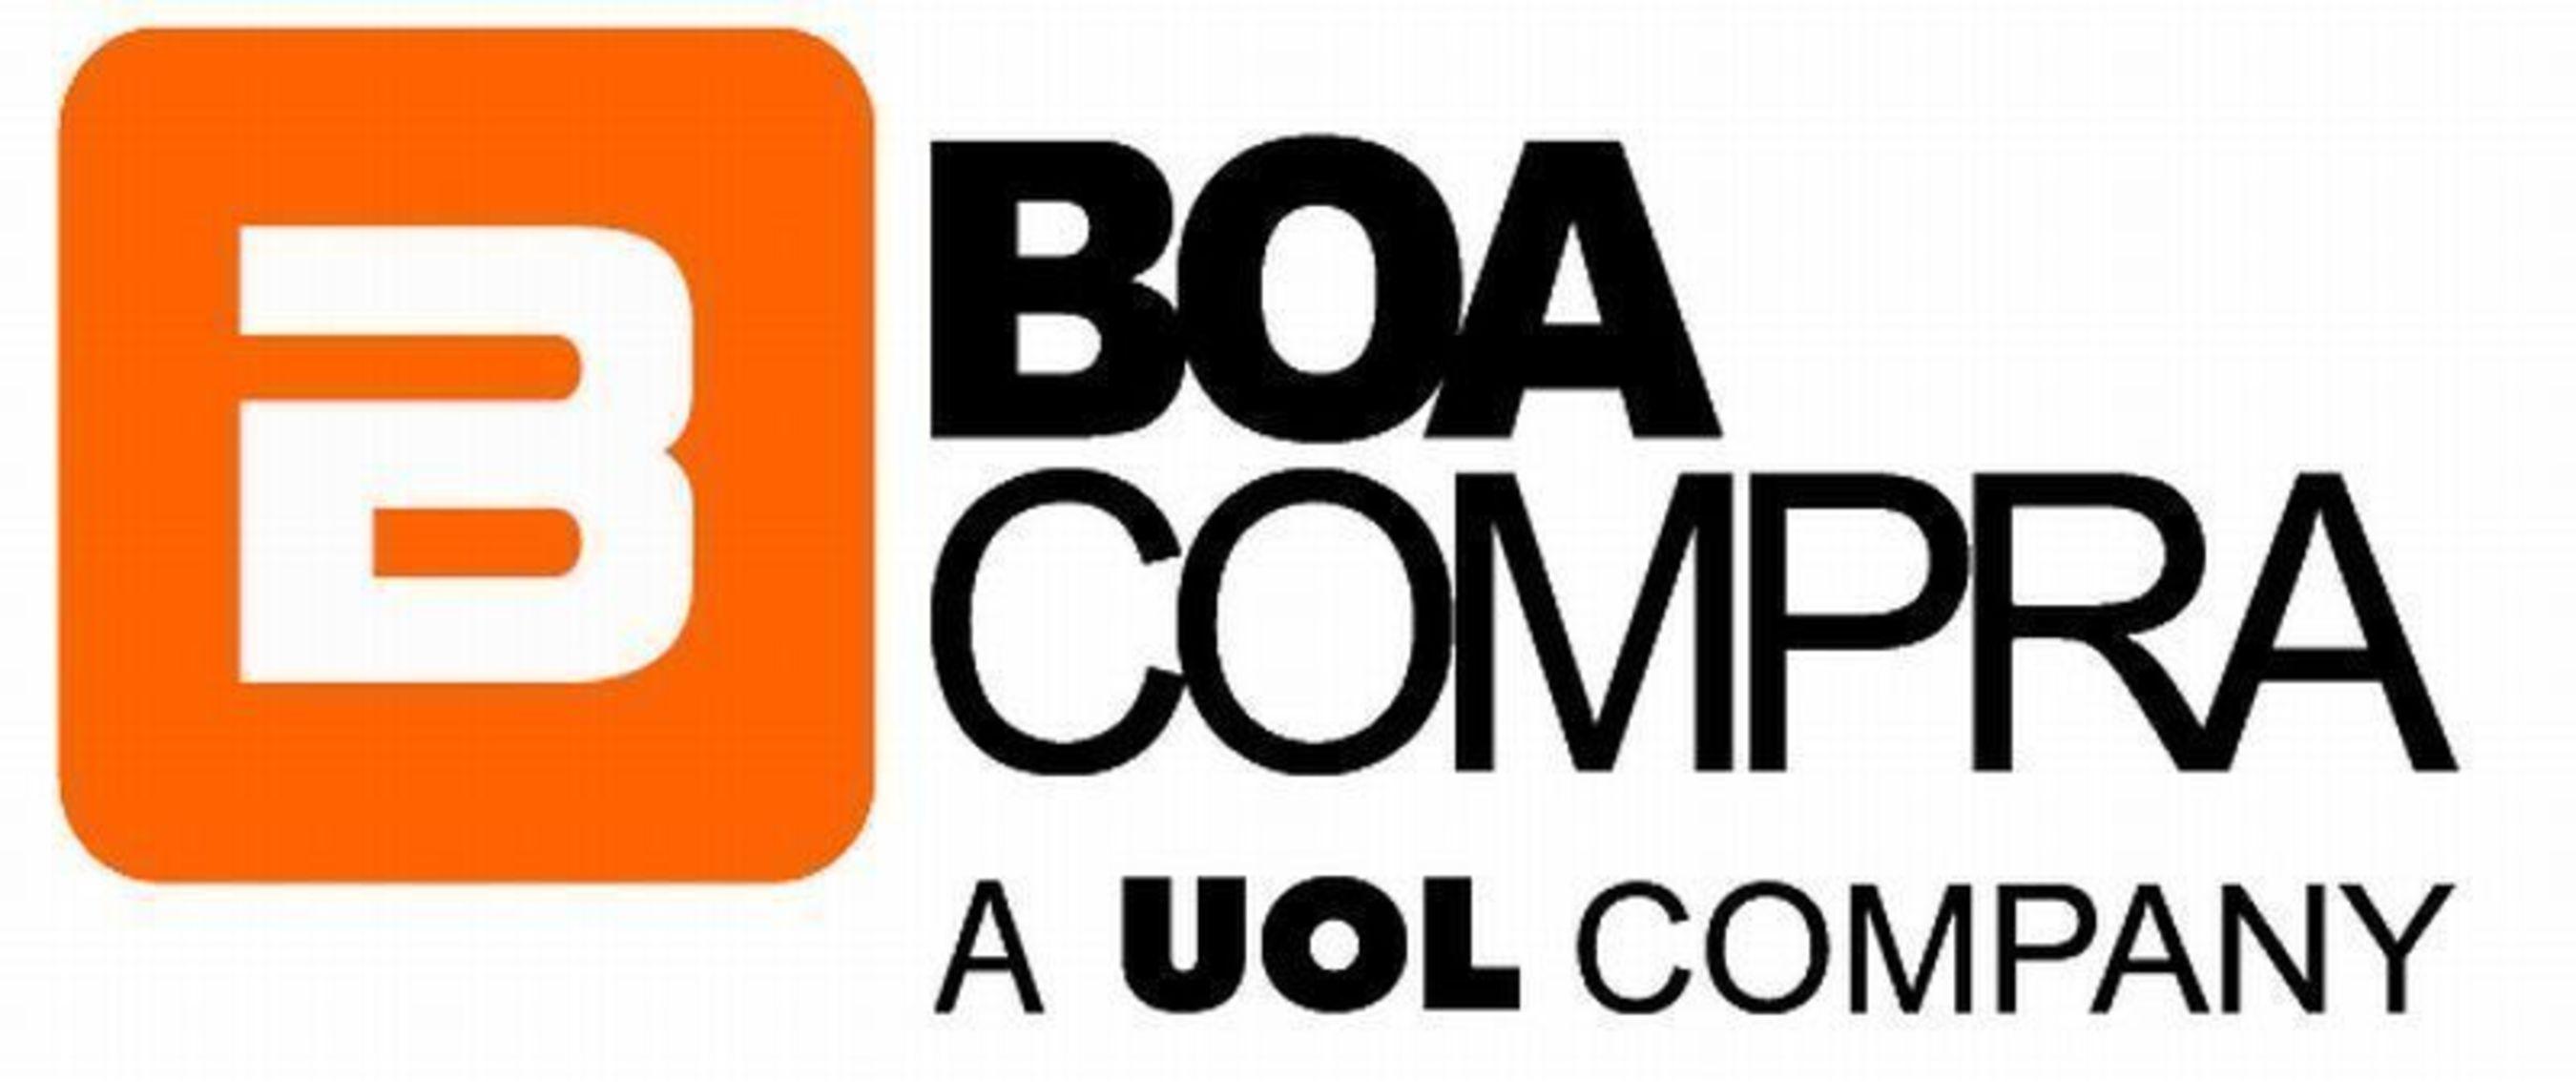 UOL BoaCompra Logo